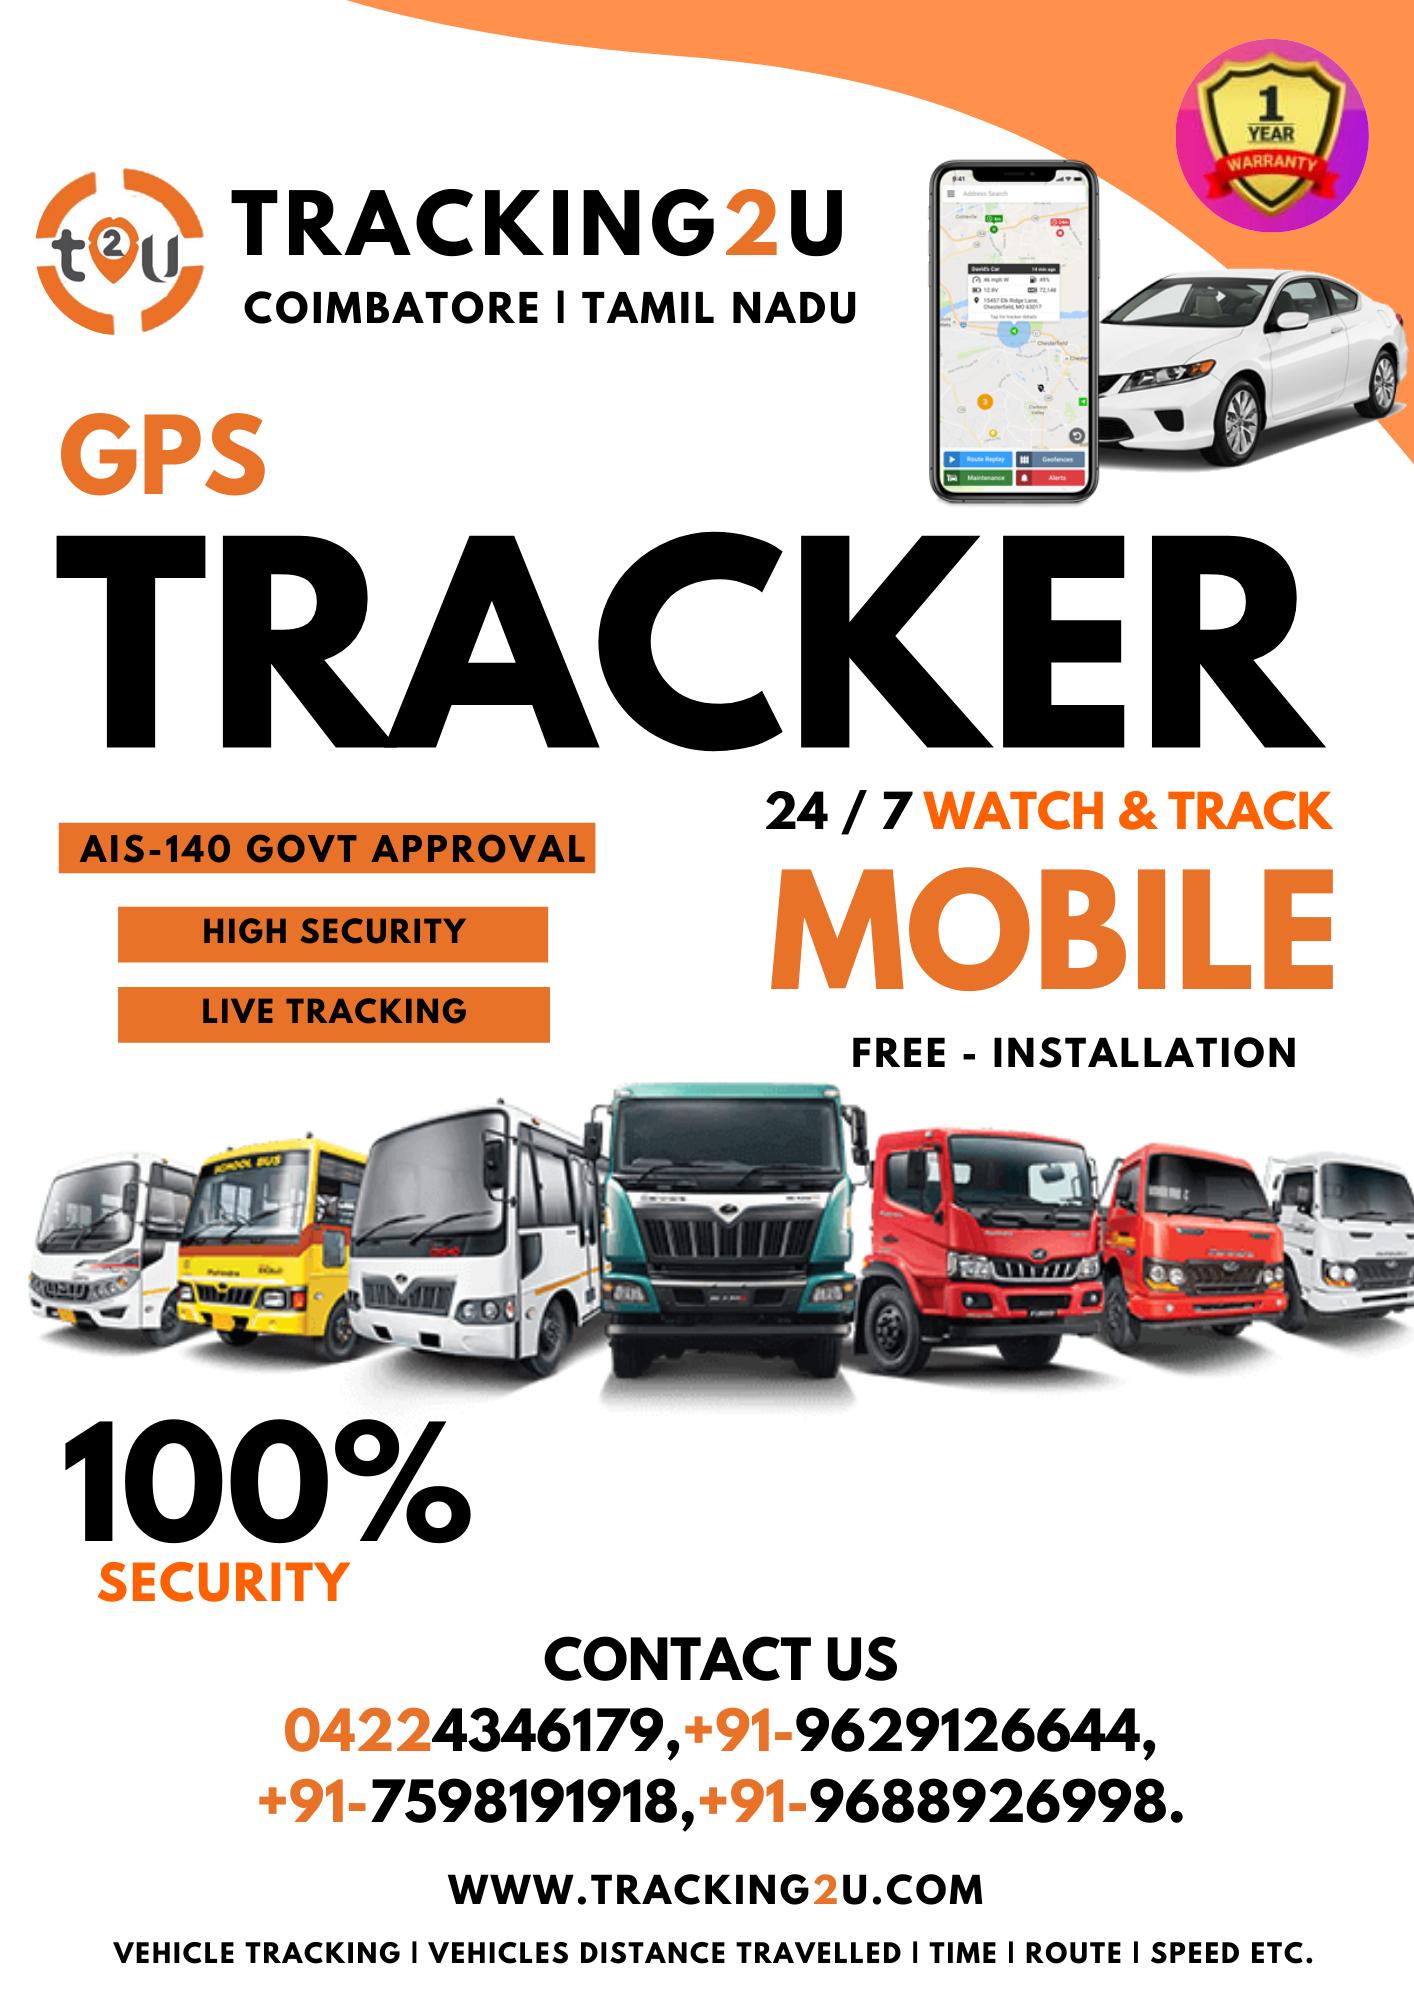 Free Trackers Tracking2u Gps Vehicle Tracking System Vehicle Tracking System Gps Vehicle Tracking Vehicle Tracking